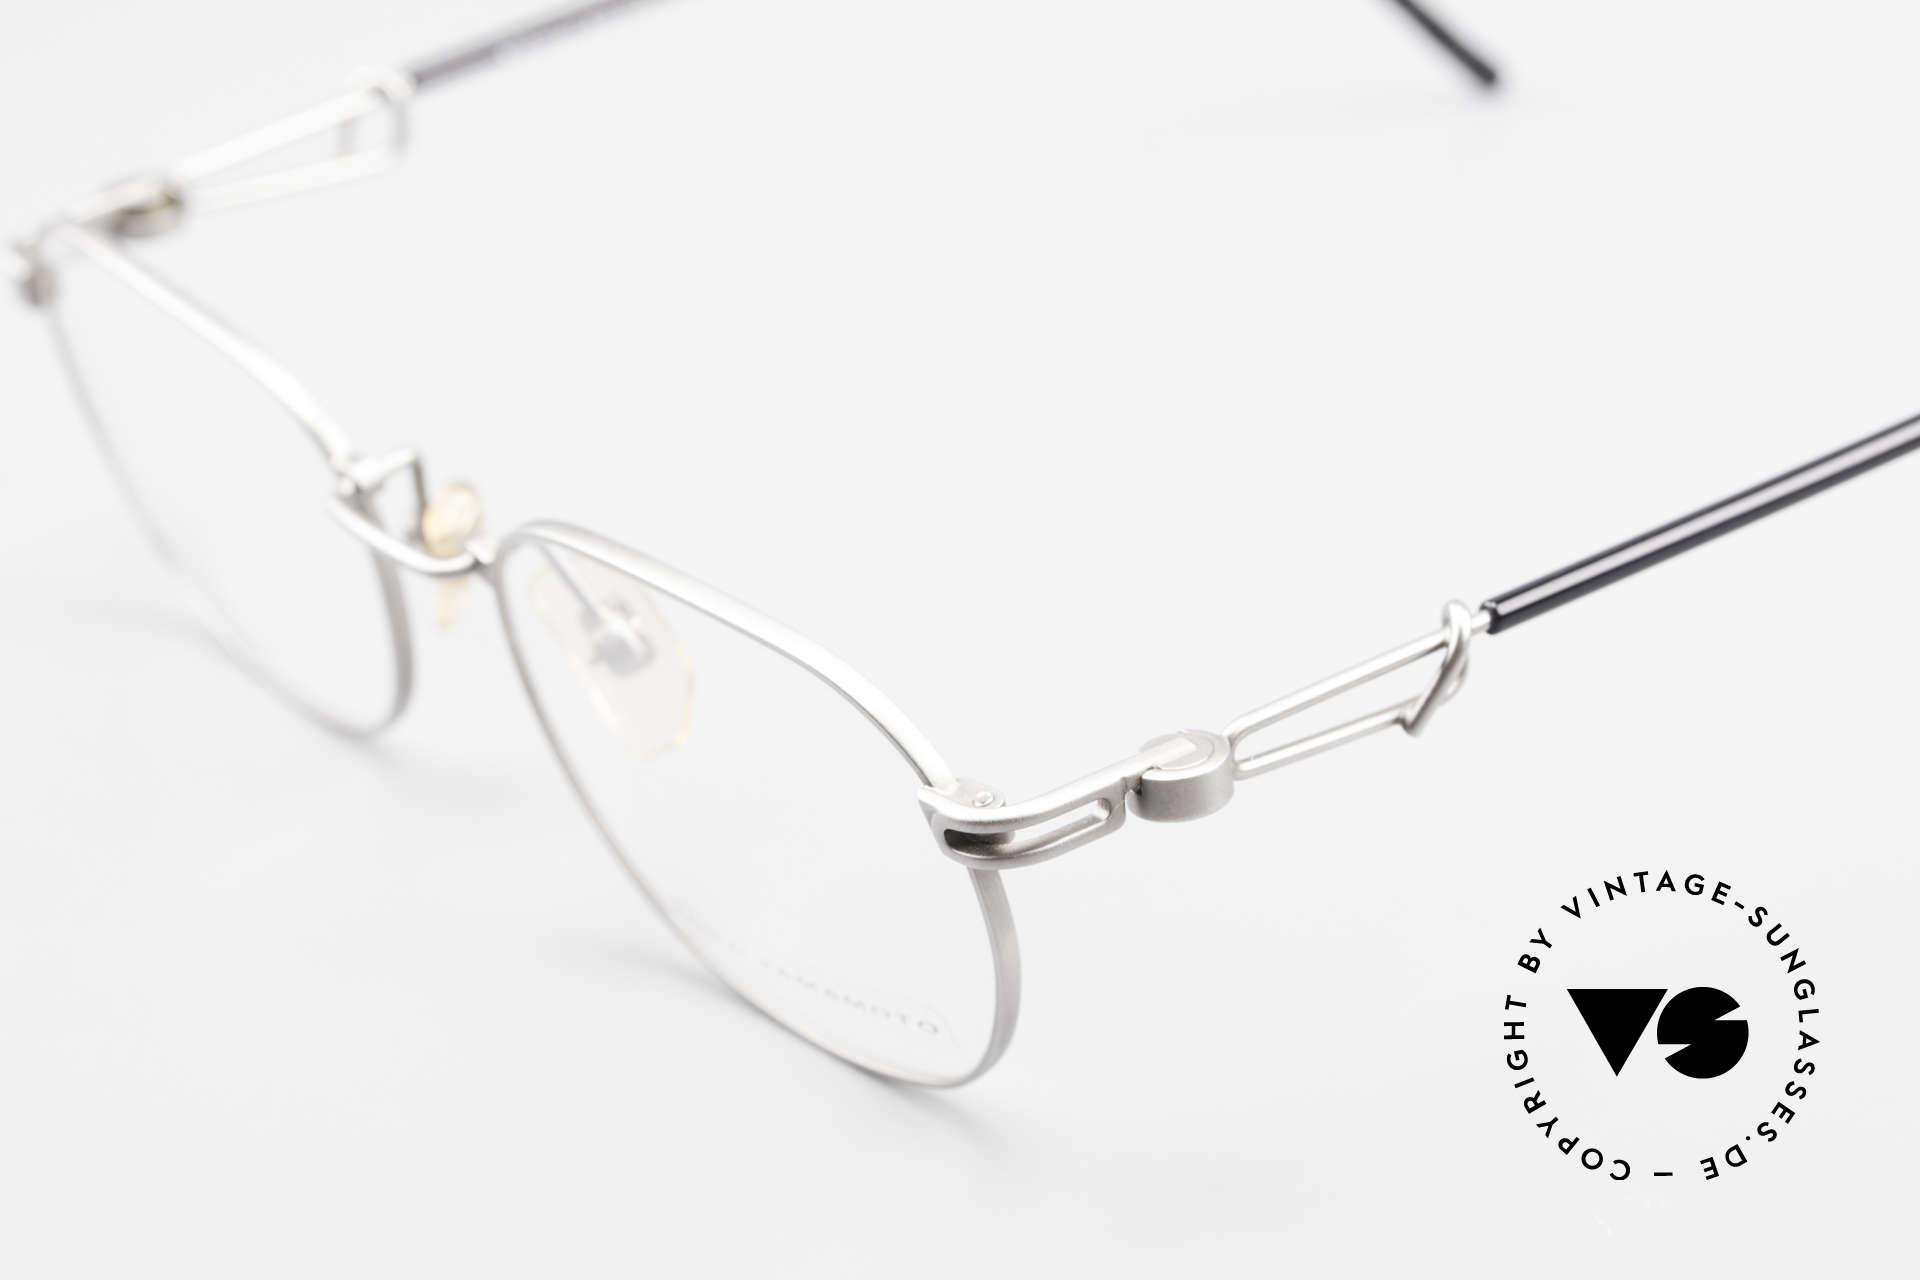 Yohji Yamamoto 51-4113 Titanium Designer Eyeglasses, NO RETRO specs, but a 25 years old Yamamoto original, Made for Men and Women